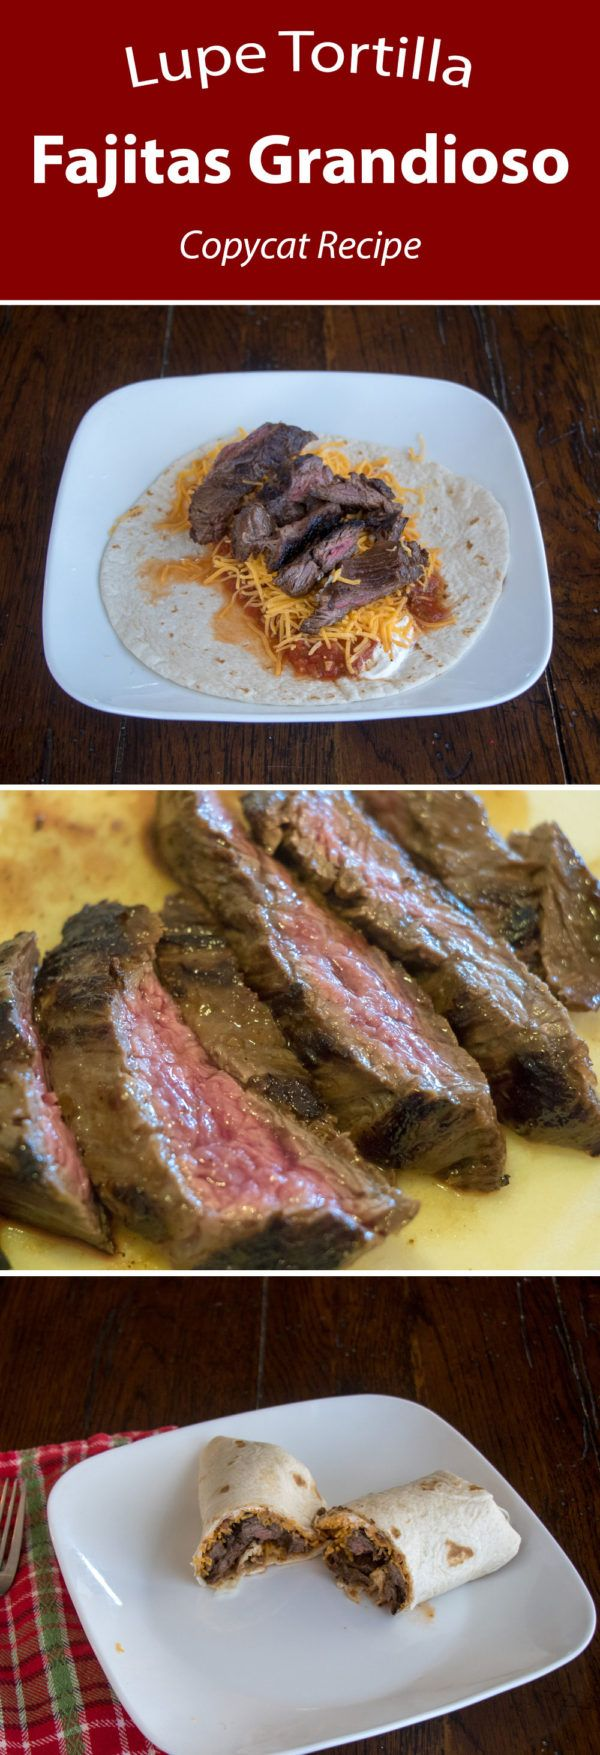 Lupe Tortilla's Fajitas Grandioso - Copycat Recipe #steakfajitarecipe